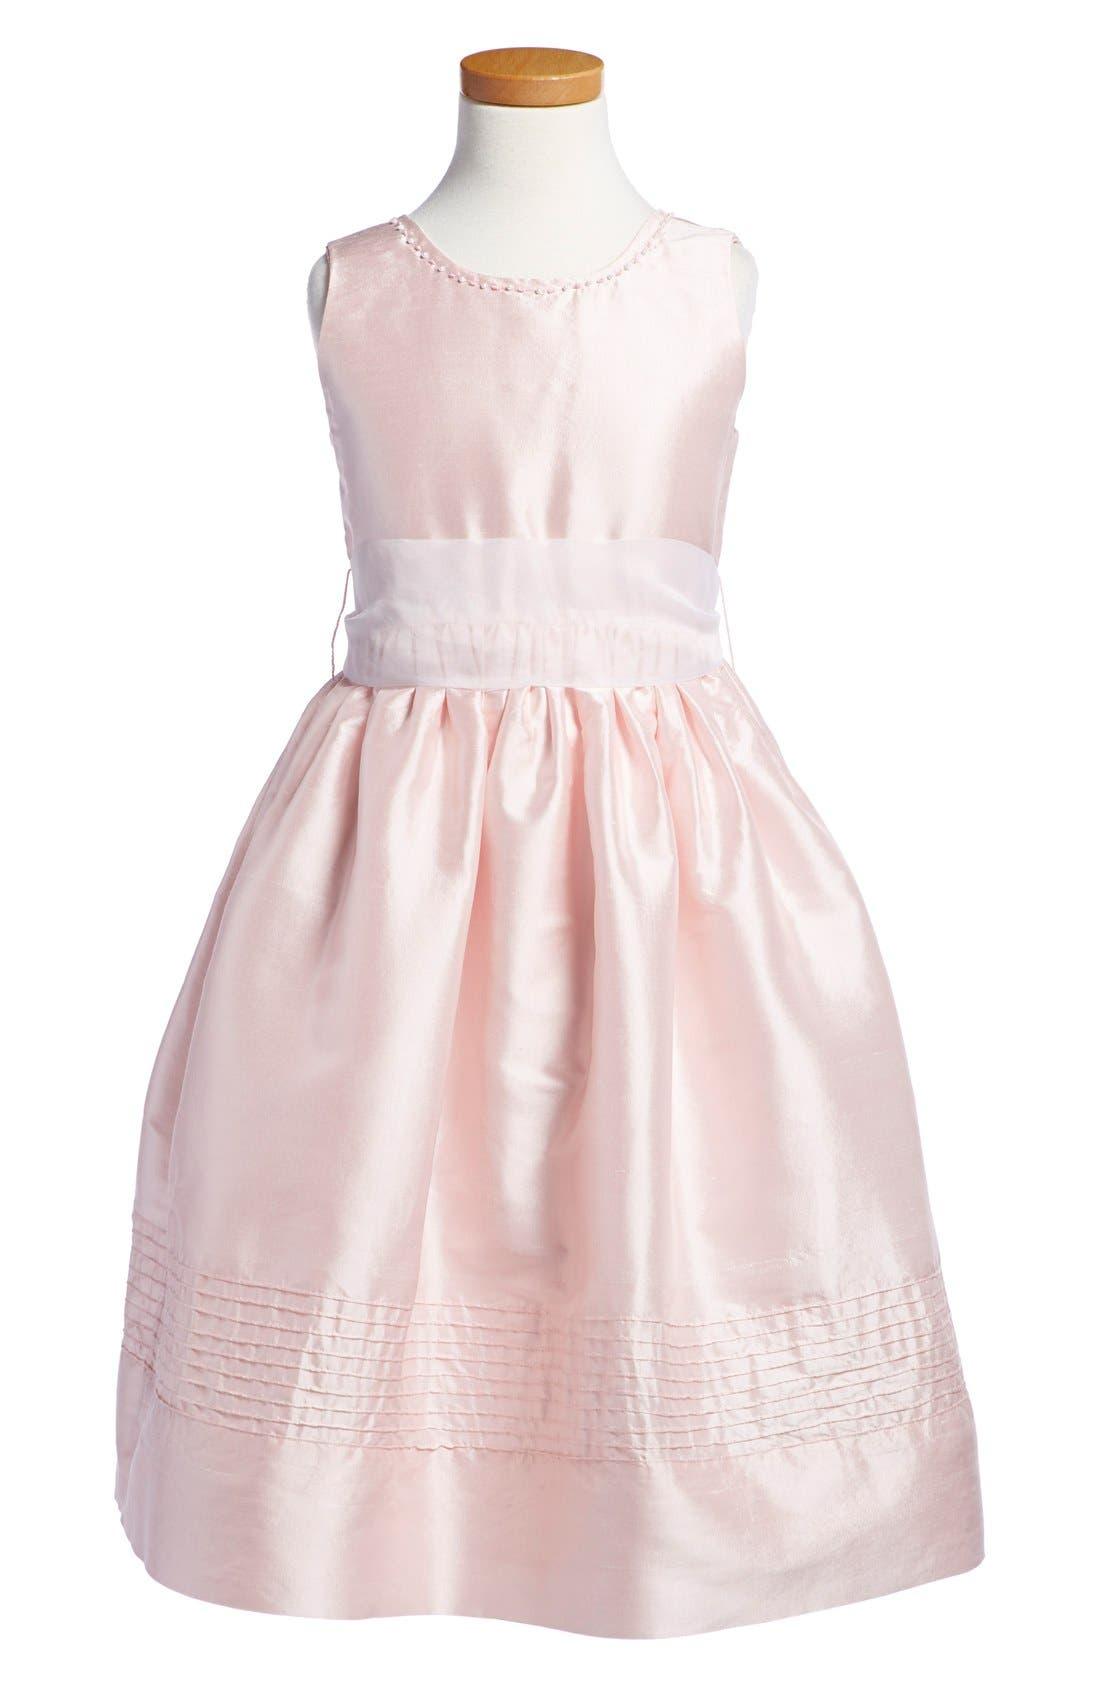 ISABEL GARRETON 'Melody' Sleeveless Dress